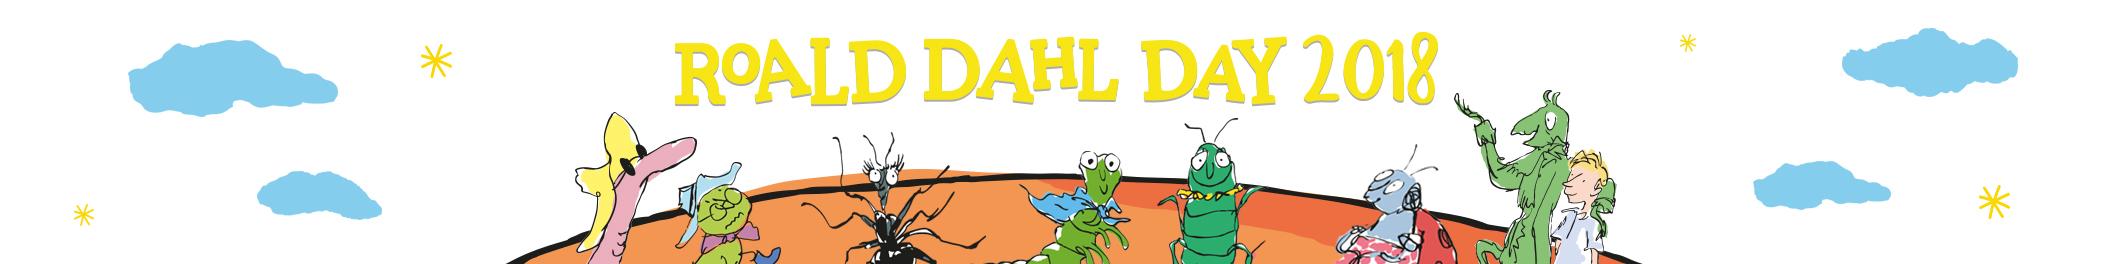 Roald Dahl Day Landing Page Banner 2112x264